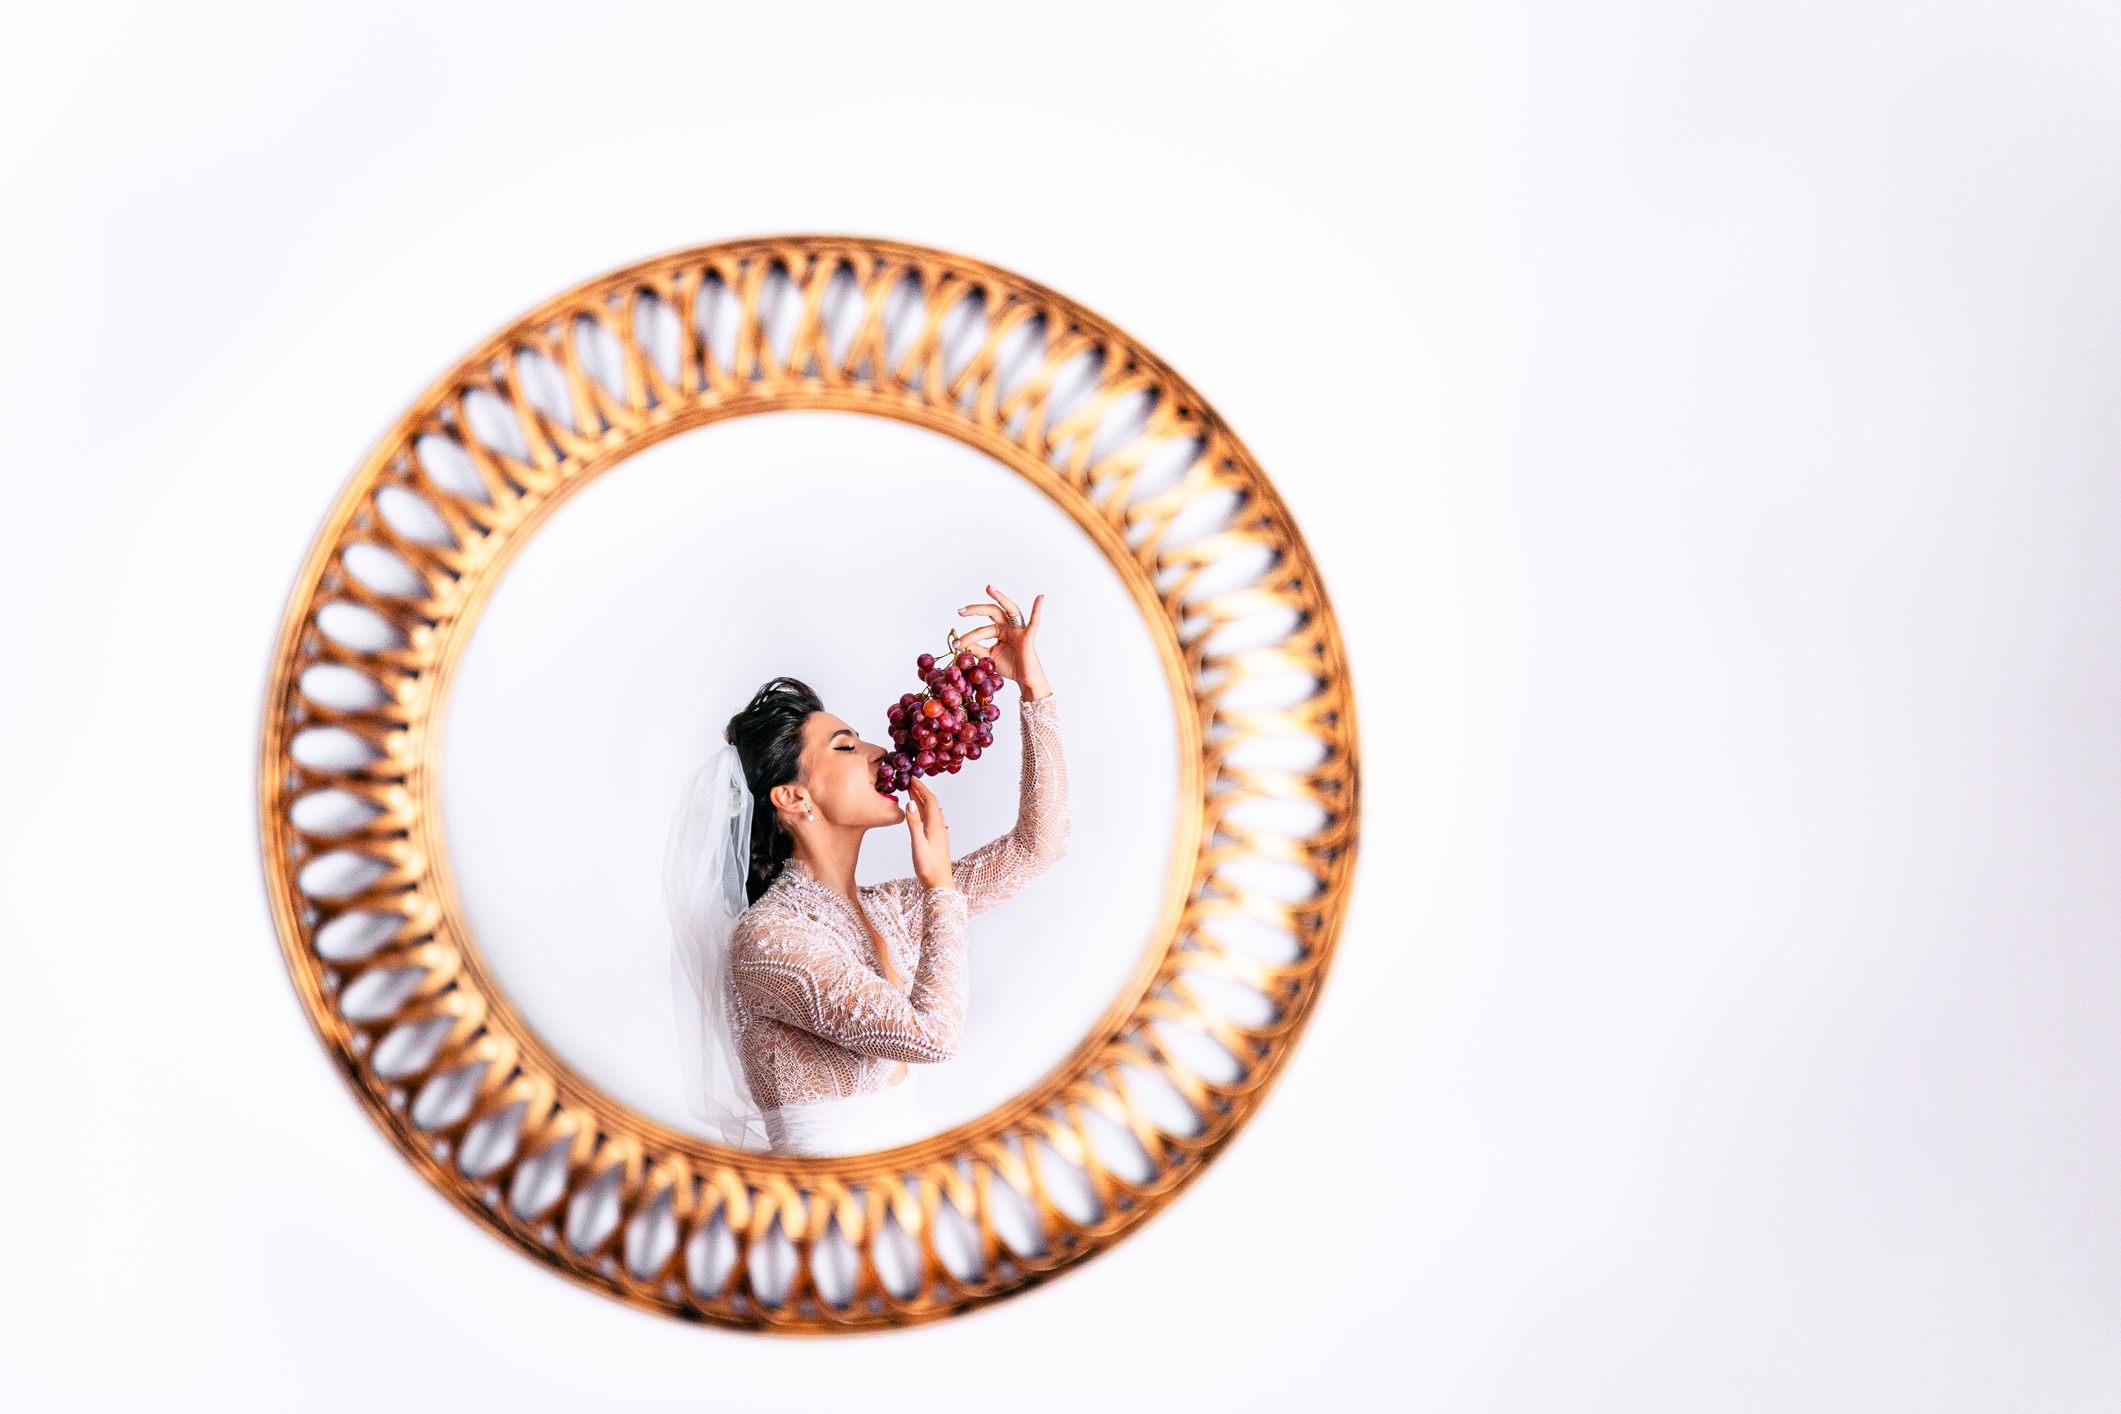 fotograf nunta bucuresti laurentiu nica  3 - Lorena & Matei | Fotografii nunta Bucuresti | Restaurant Domeniul cu Ciresi